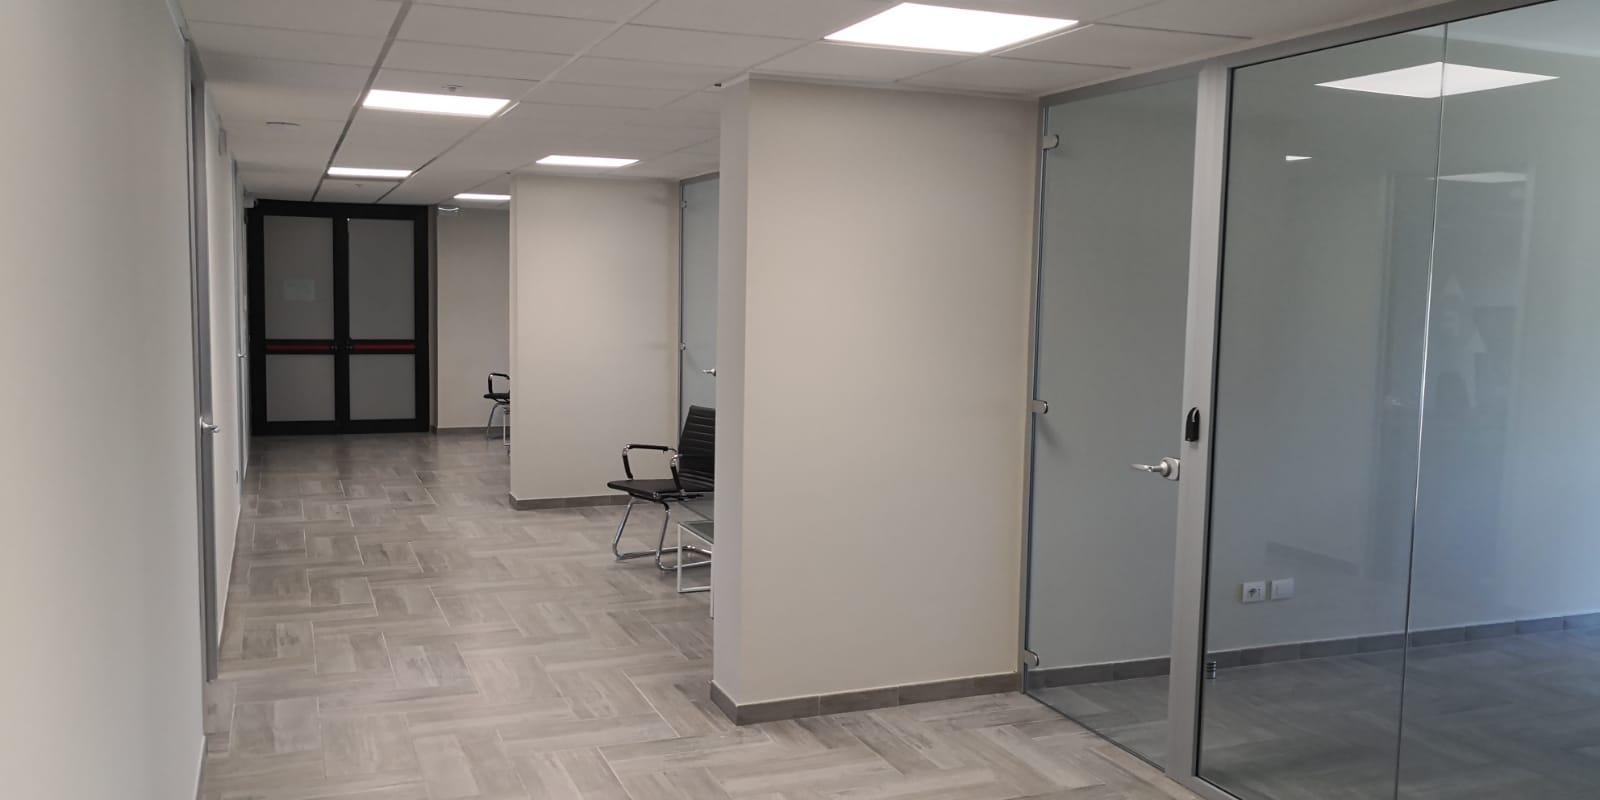 Arredamento_e_ristrutturazione_aziendale_GruppoPscSpa_GruppoSmau (14)